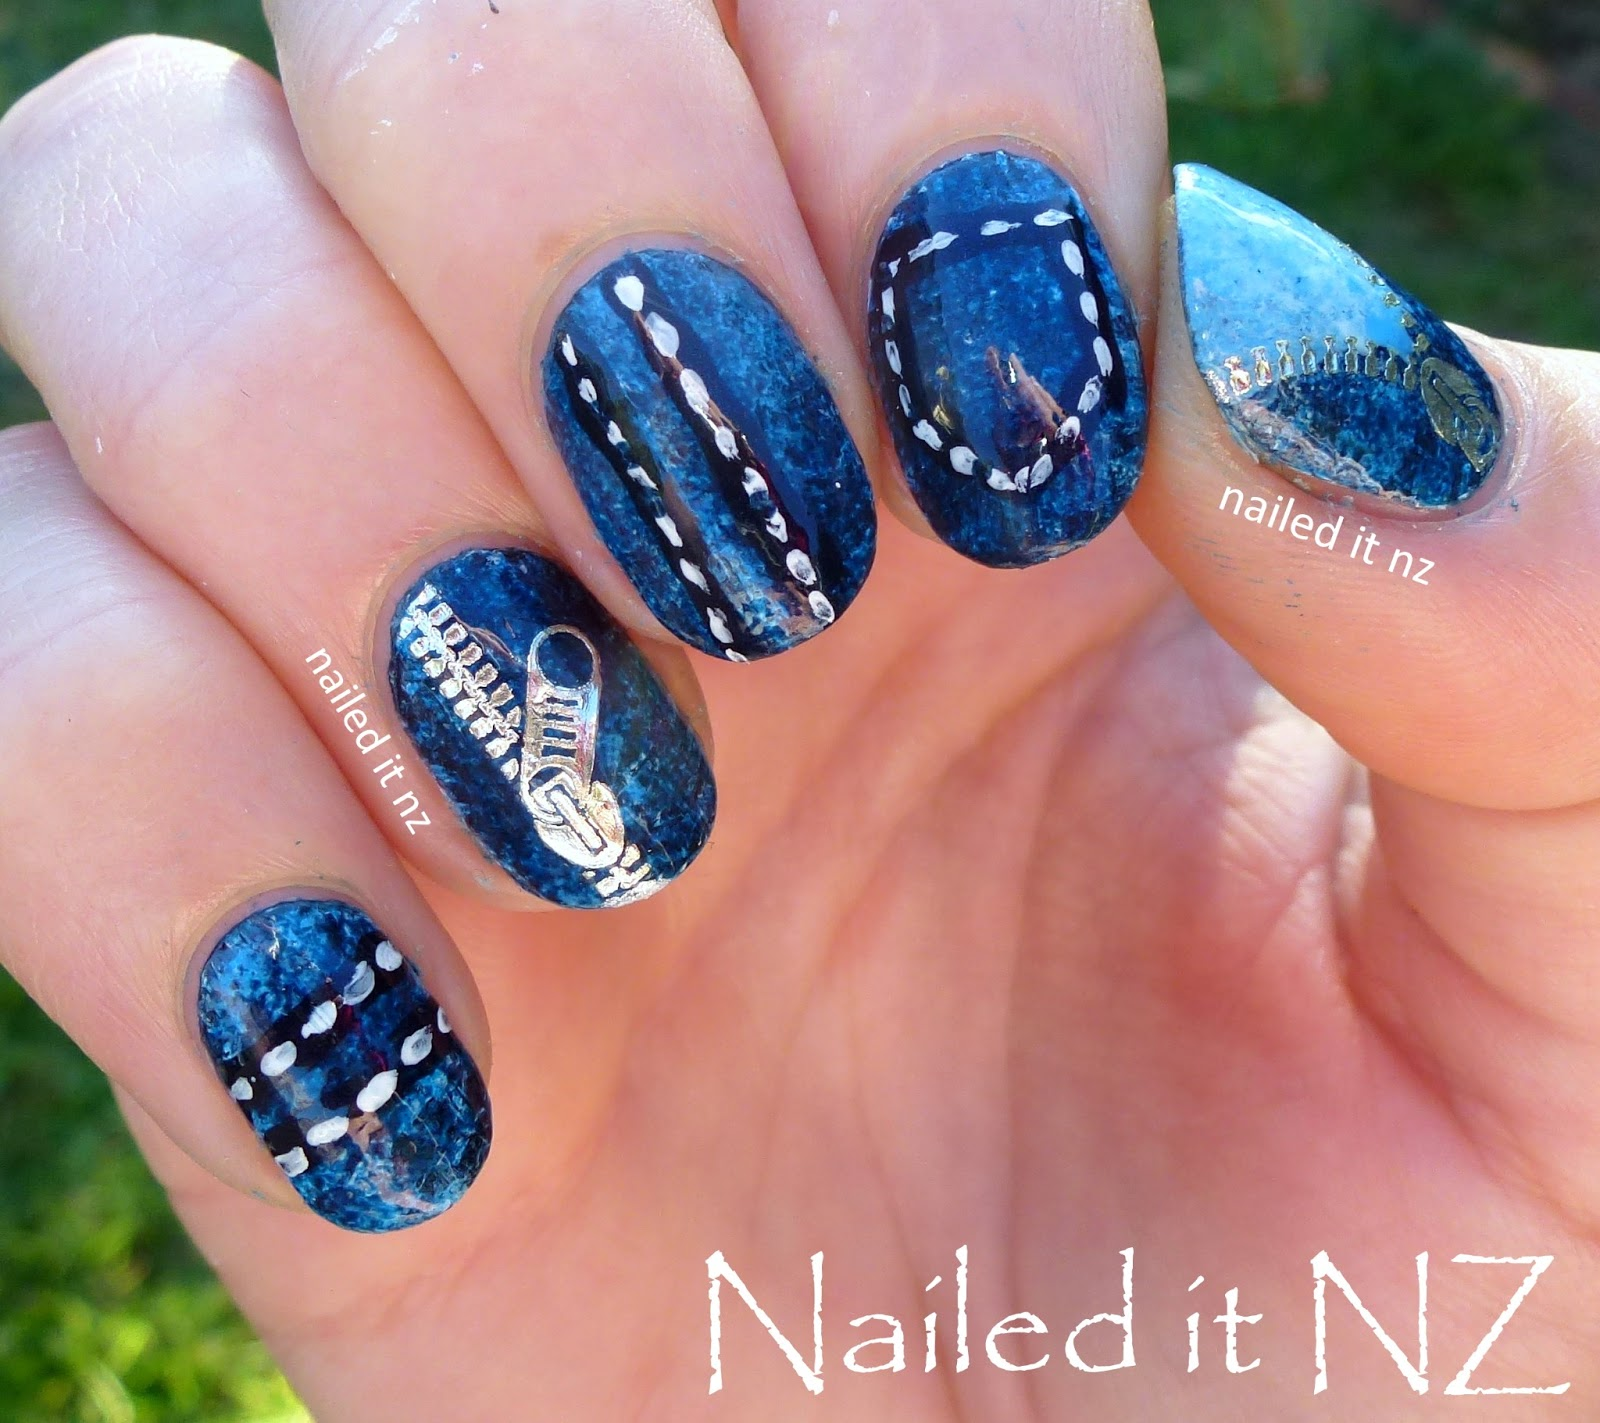 Denim nails - zip decor review for Born Pretty Store